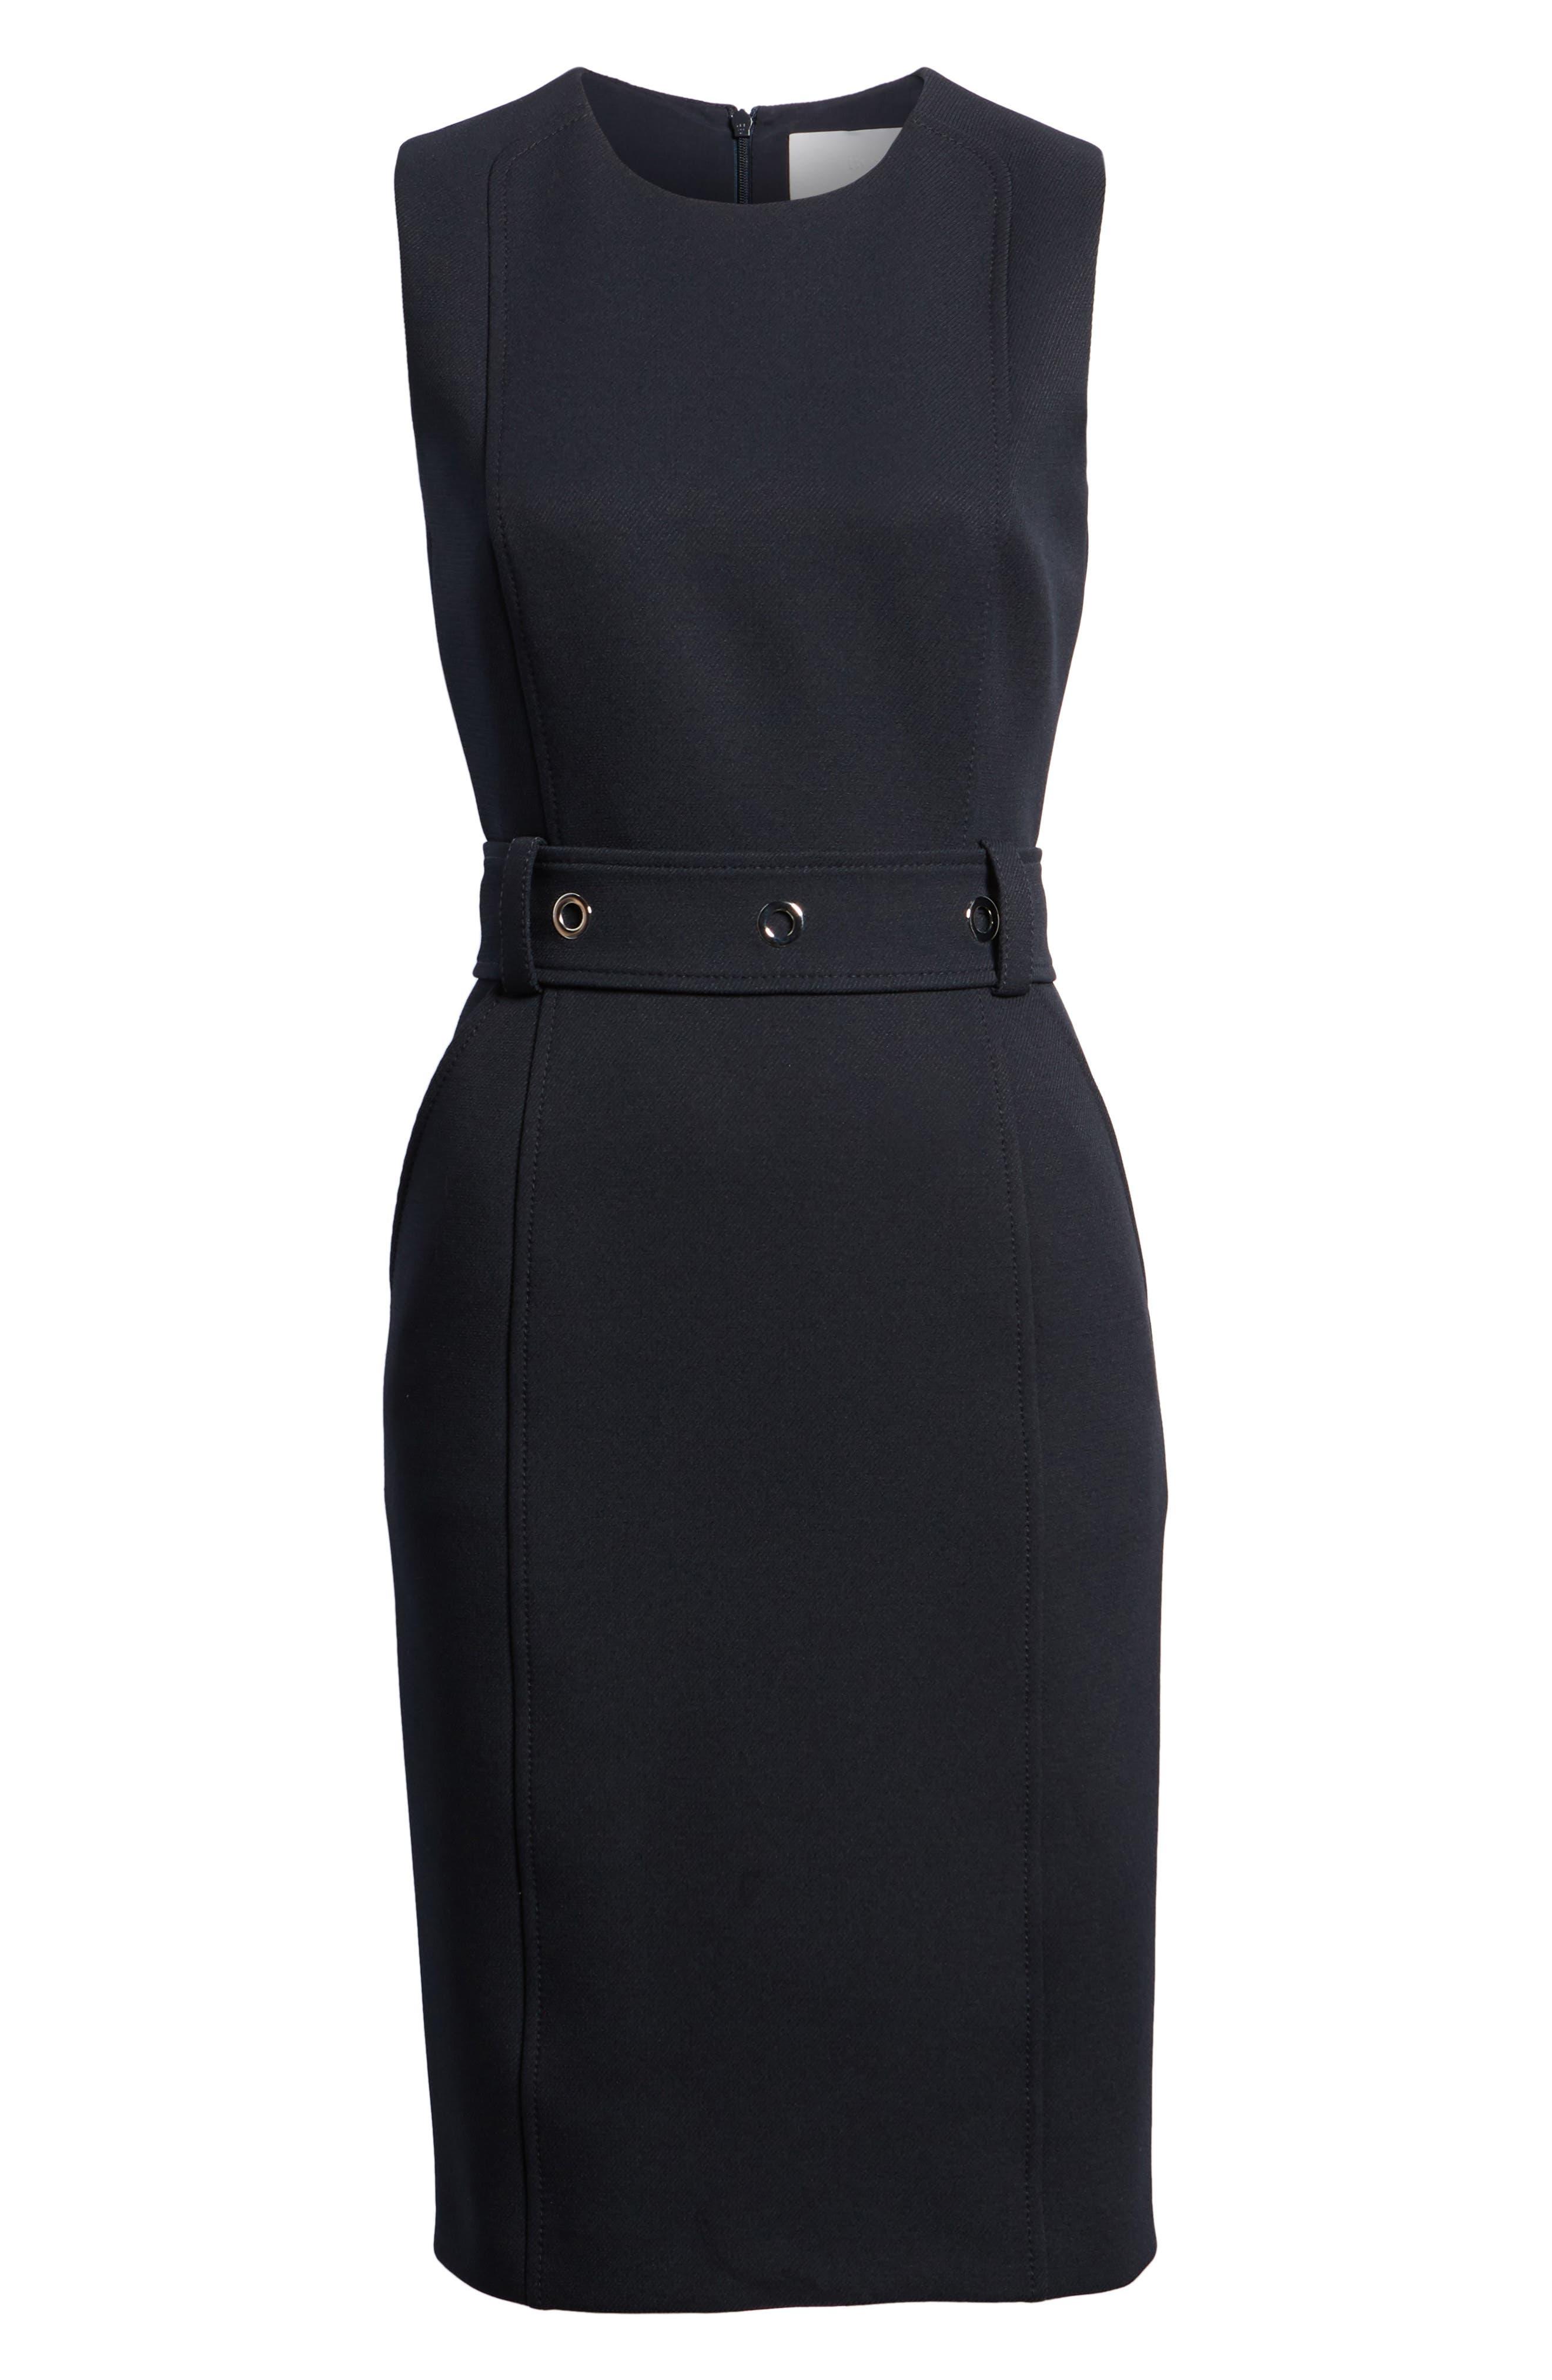 Duleama Belted Sheath Dress,                             Alternate thumbnail 6, color,                             Navy